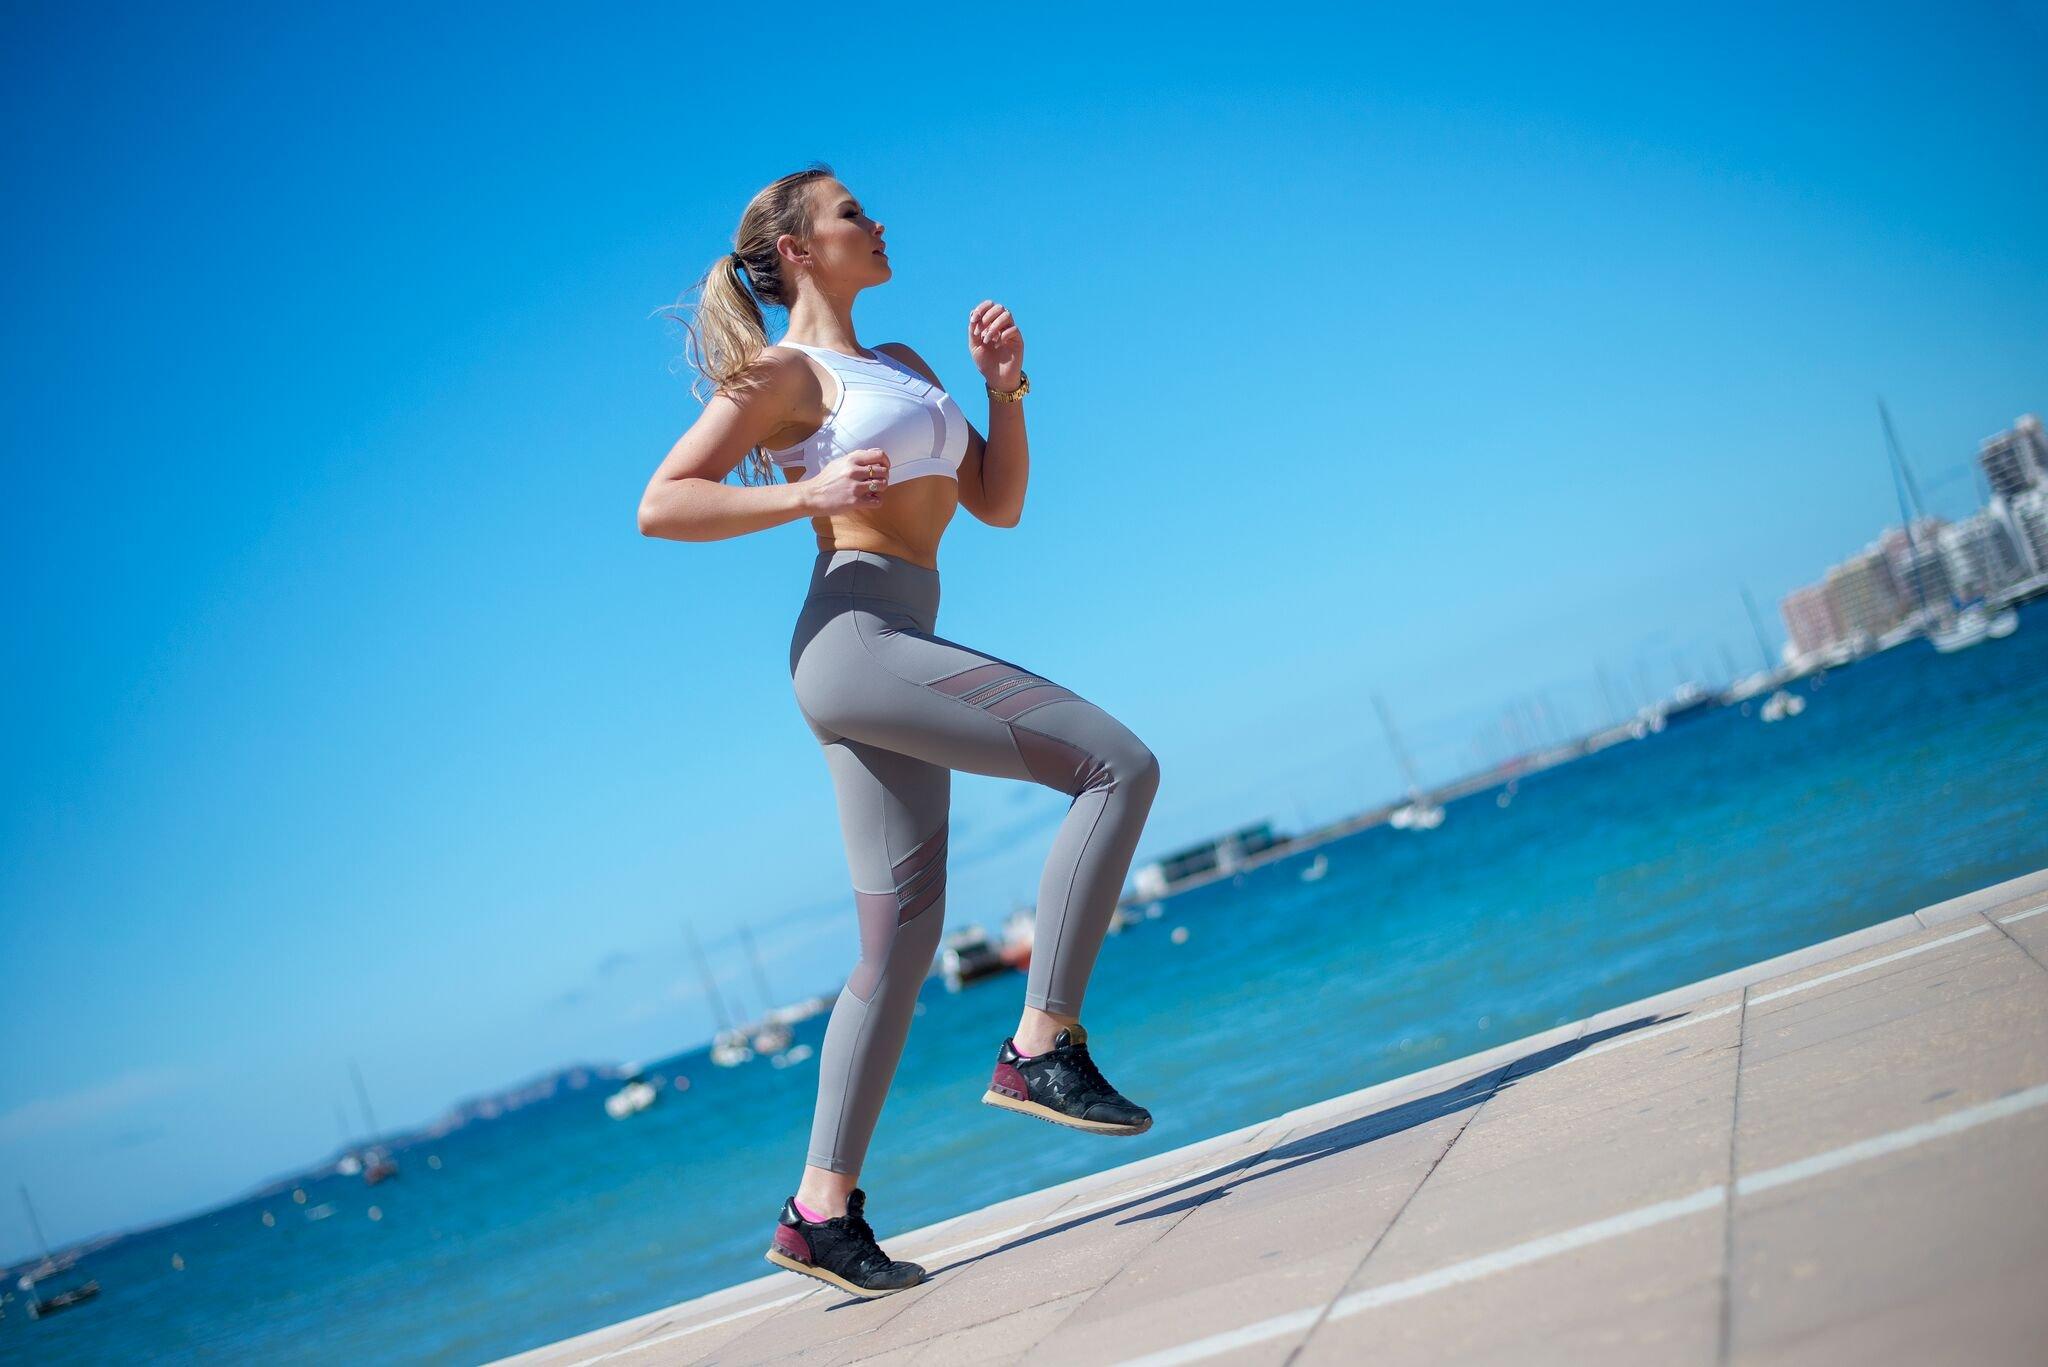 Light&Leaf Women's High Impact Padded Open Back Yoga Sports Bra Crop Tank Top by Light&Leaf (Image #5)